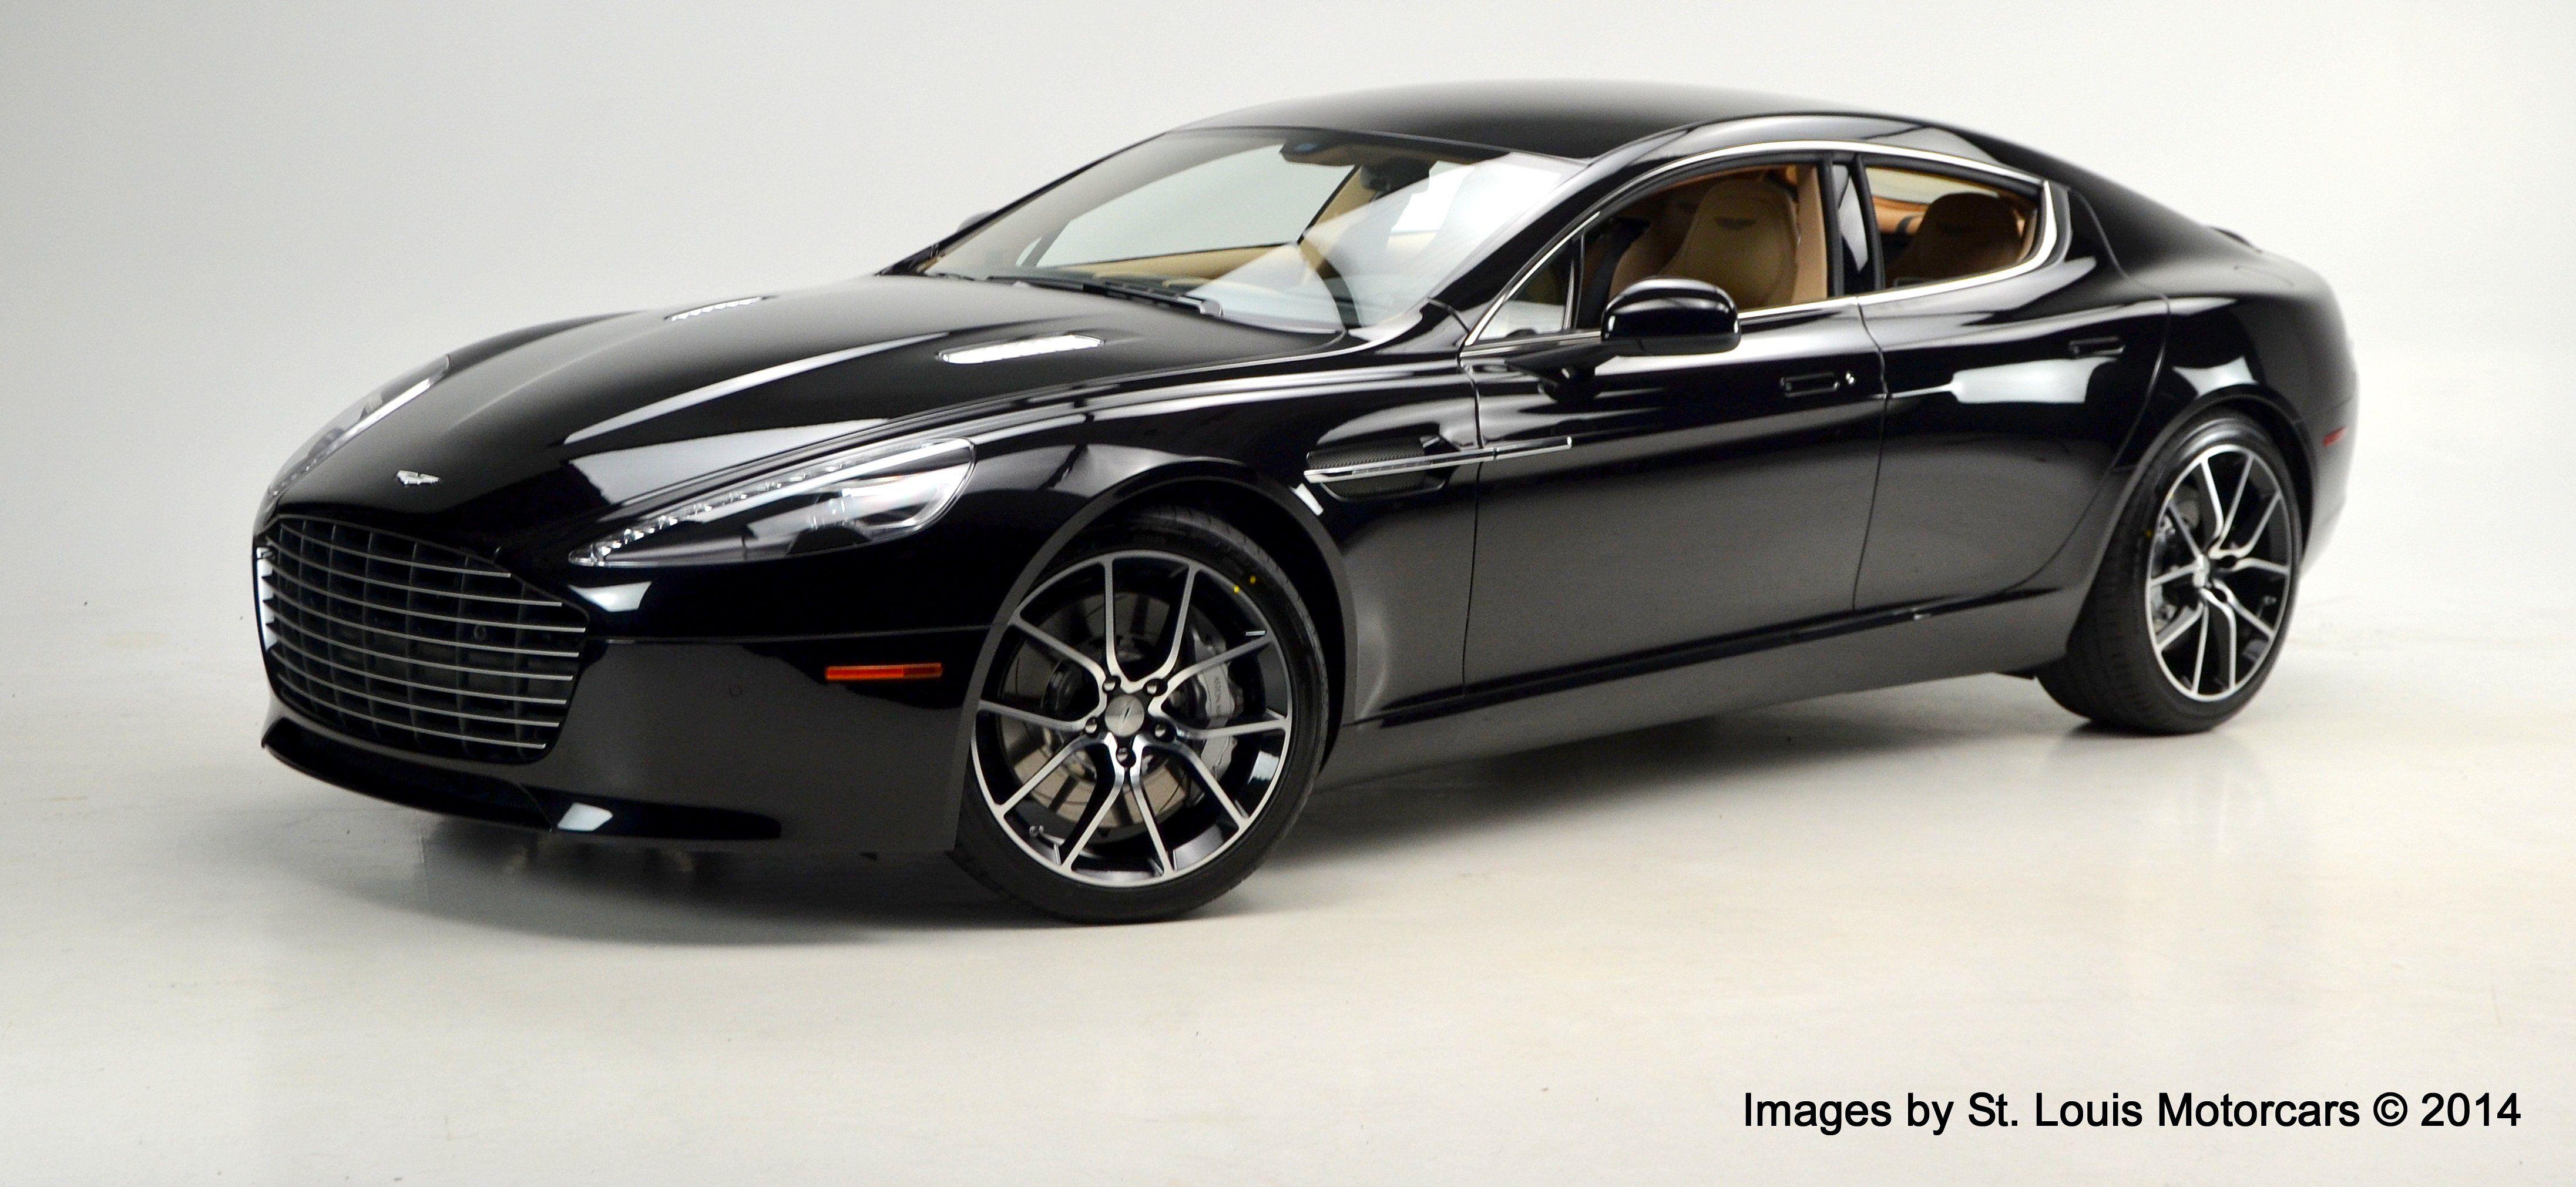 2014 Aston Martin Rapide S Finished In Onyx Black Over Sandstorm Stlmotorcars Aston Martin Rapide Aston Martin Aston